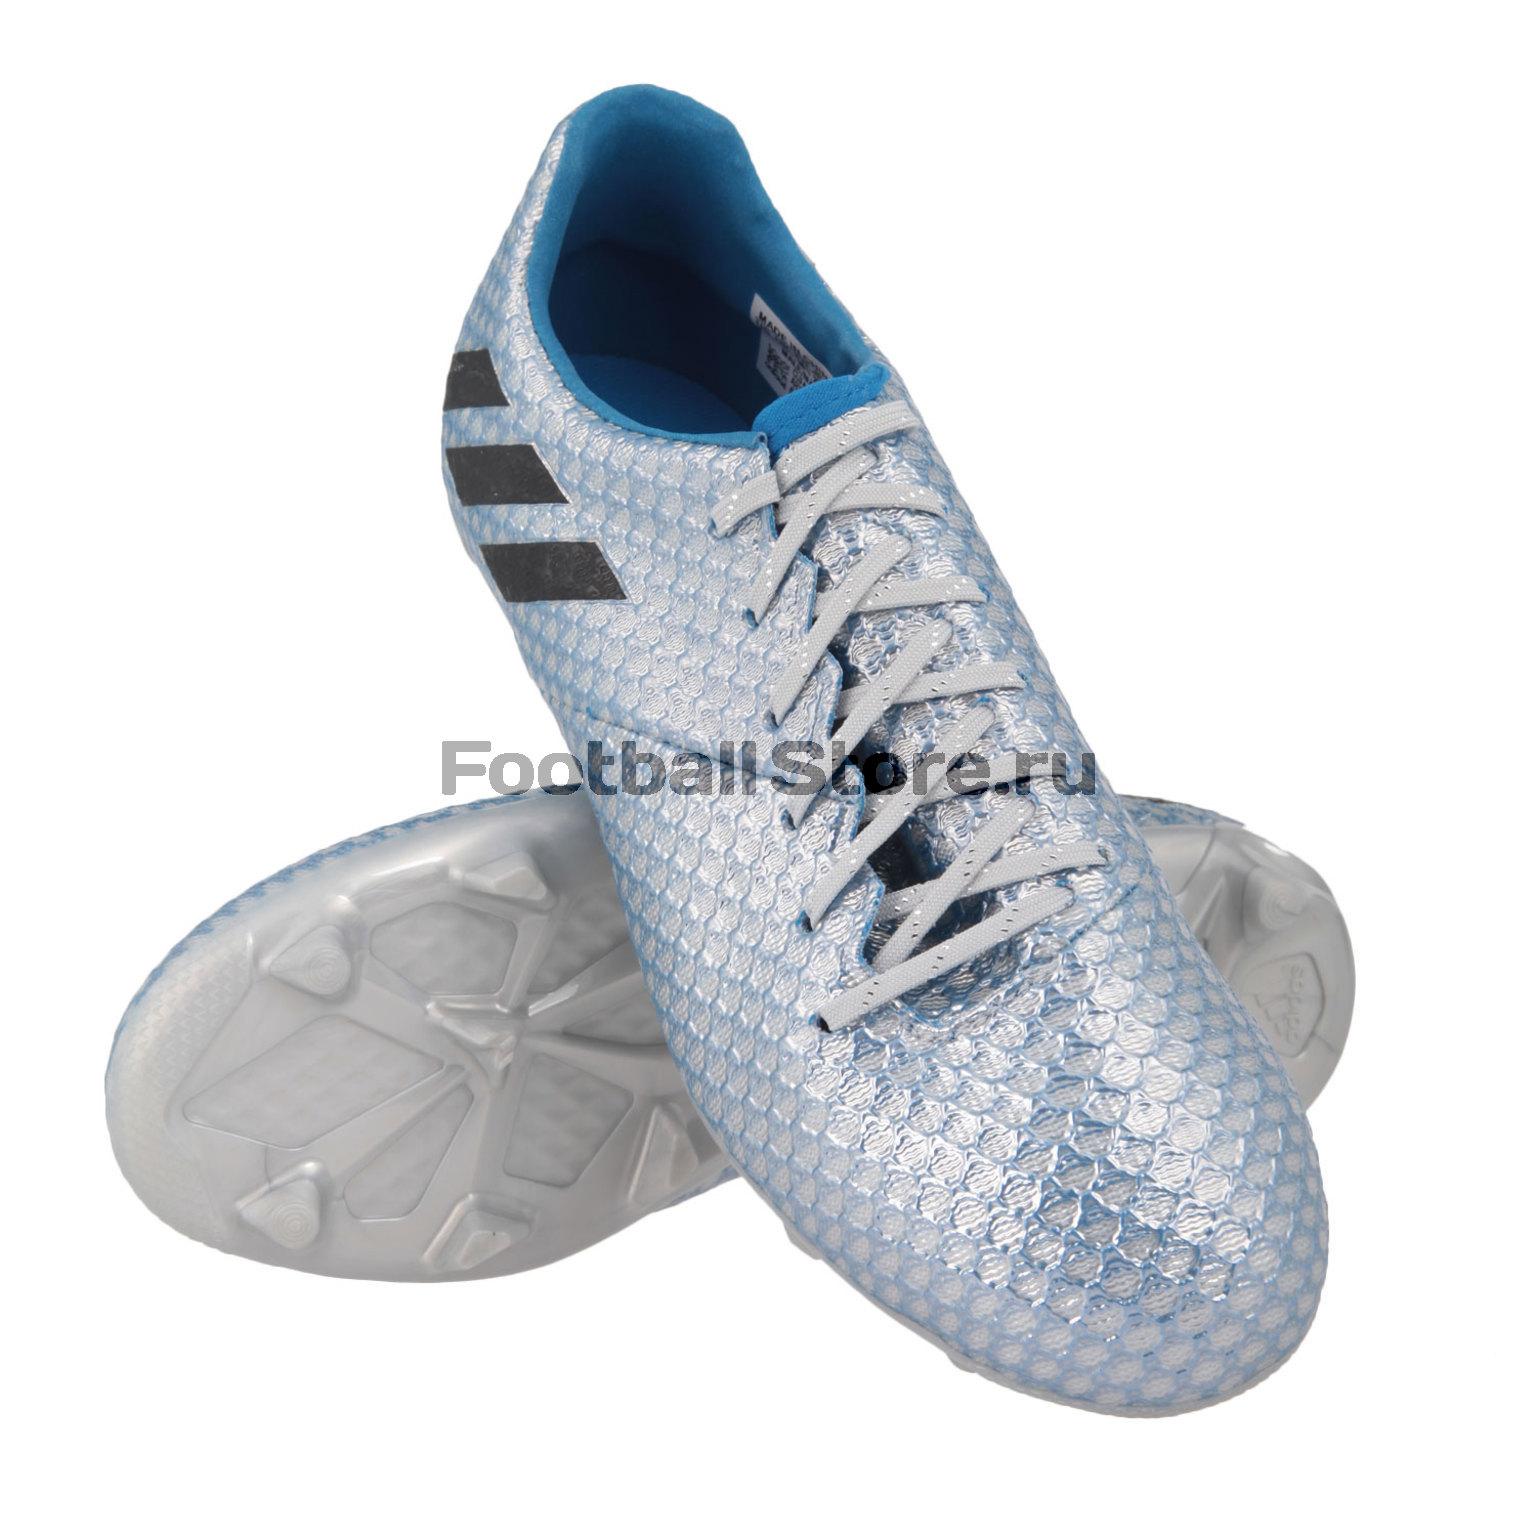 Детские бутсы Adidas Бутсы Adidas Messi 16.1 FG JR BB3850